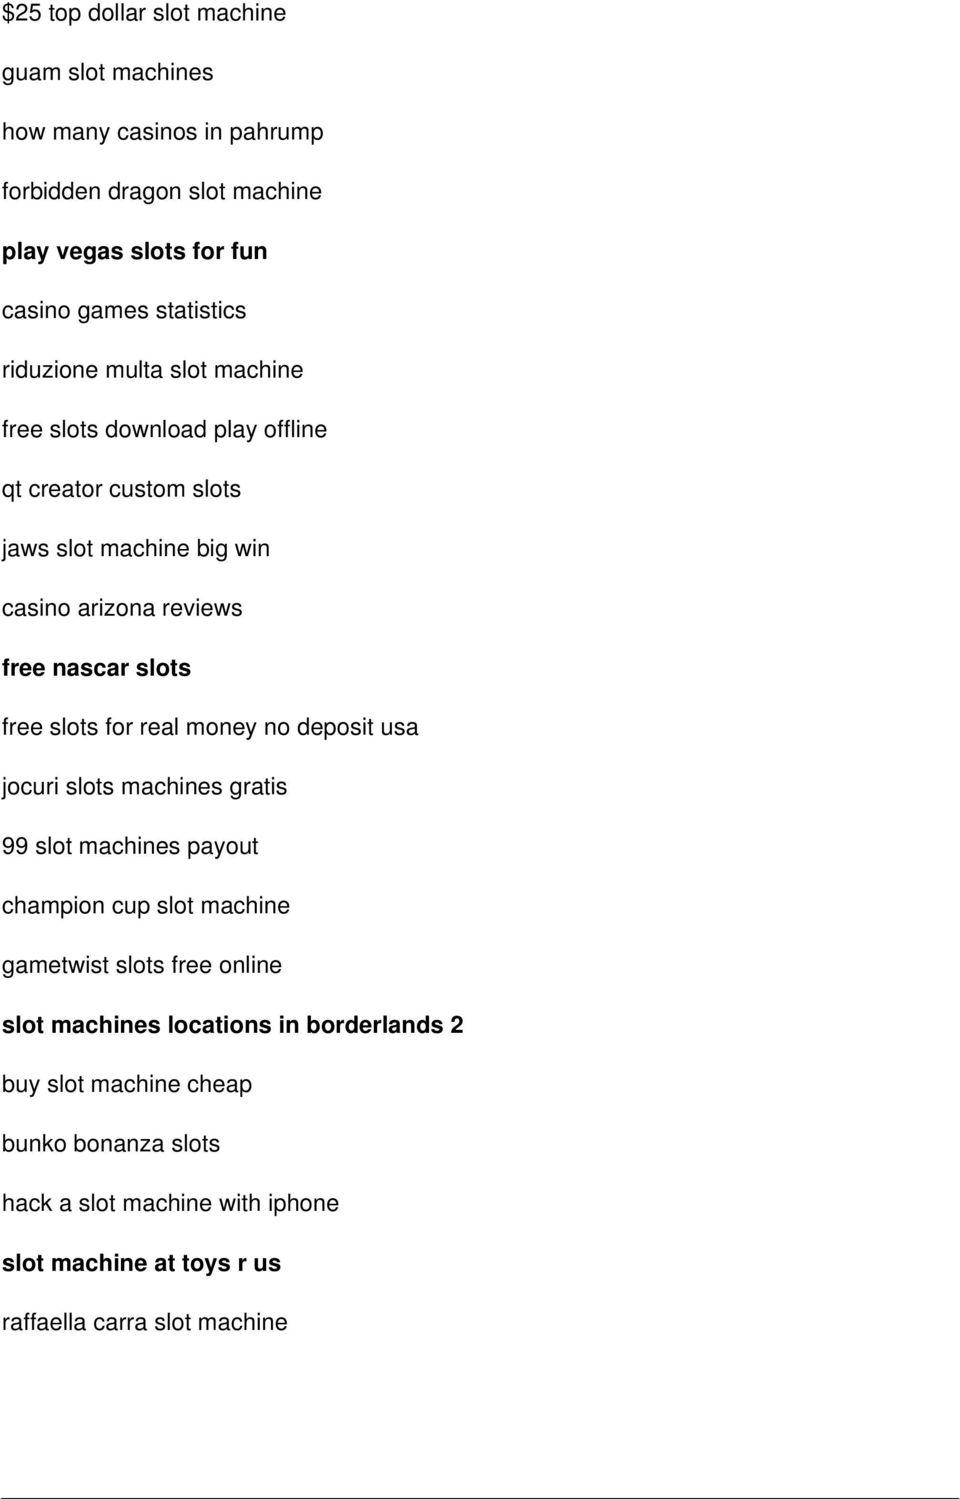 Jugar golden goddess en linea gratis casino online Lisboa opiniones 167308